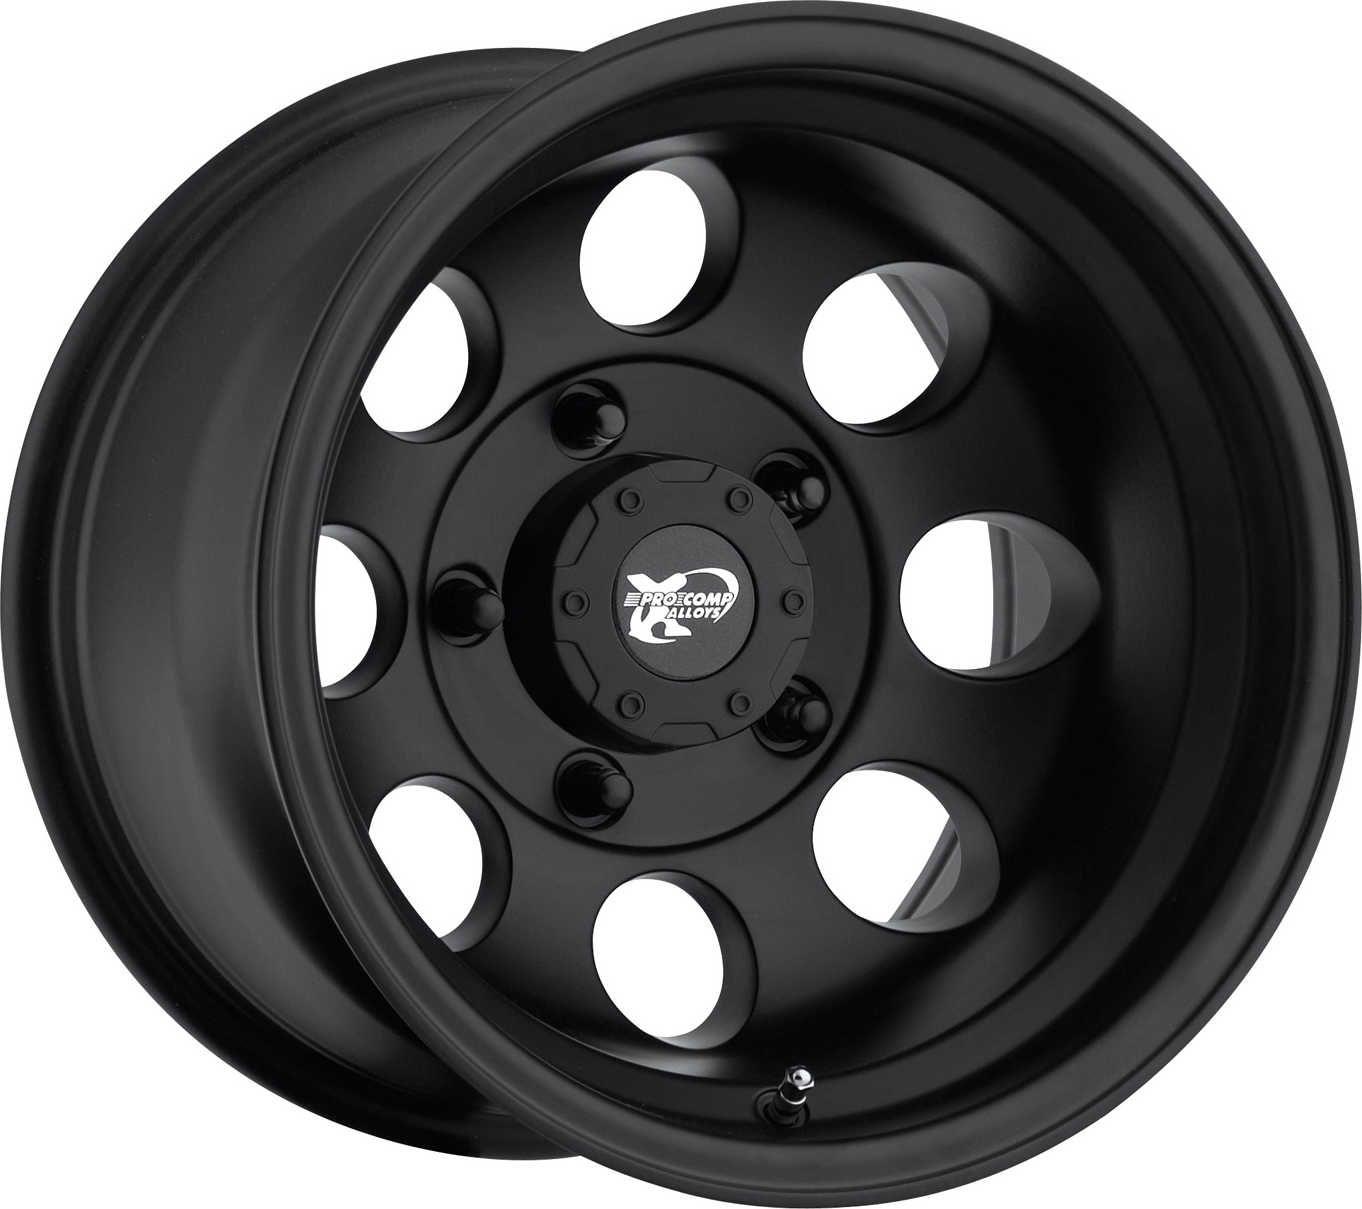 Pro Comp Series 7069 Wheel For 55 86 Jeep Cj Pro Comp Black